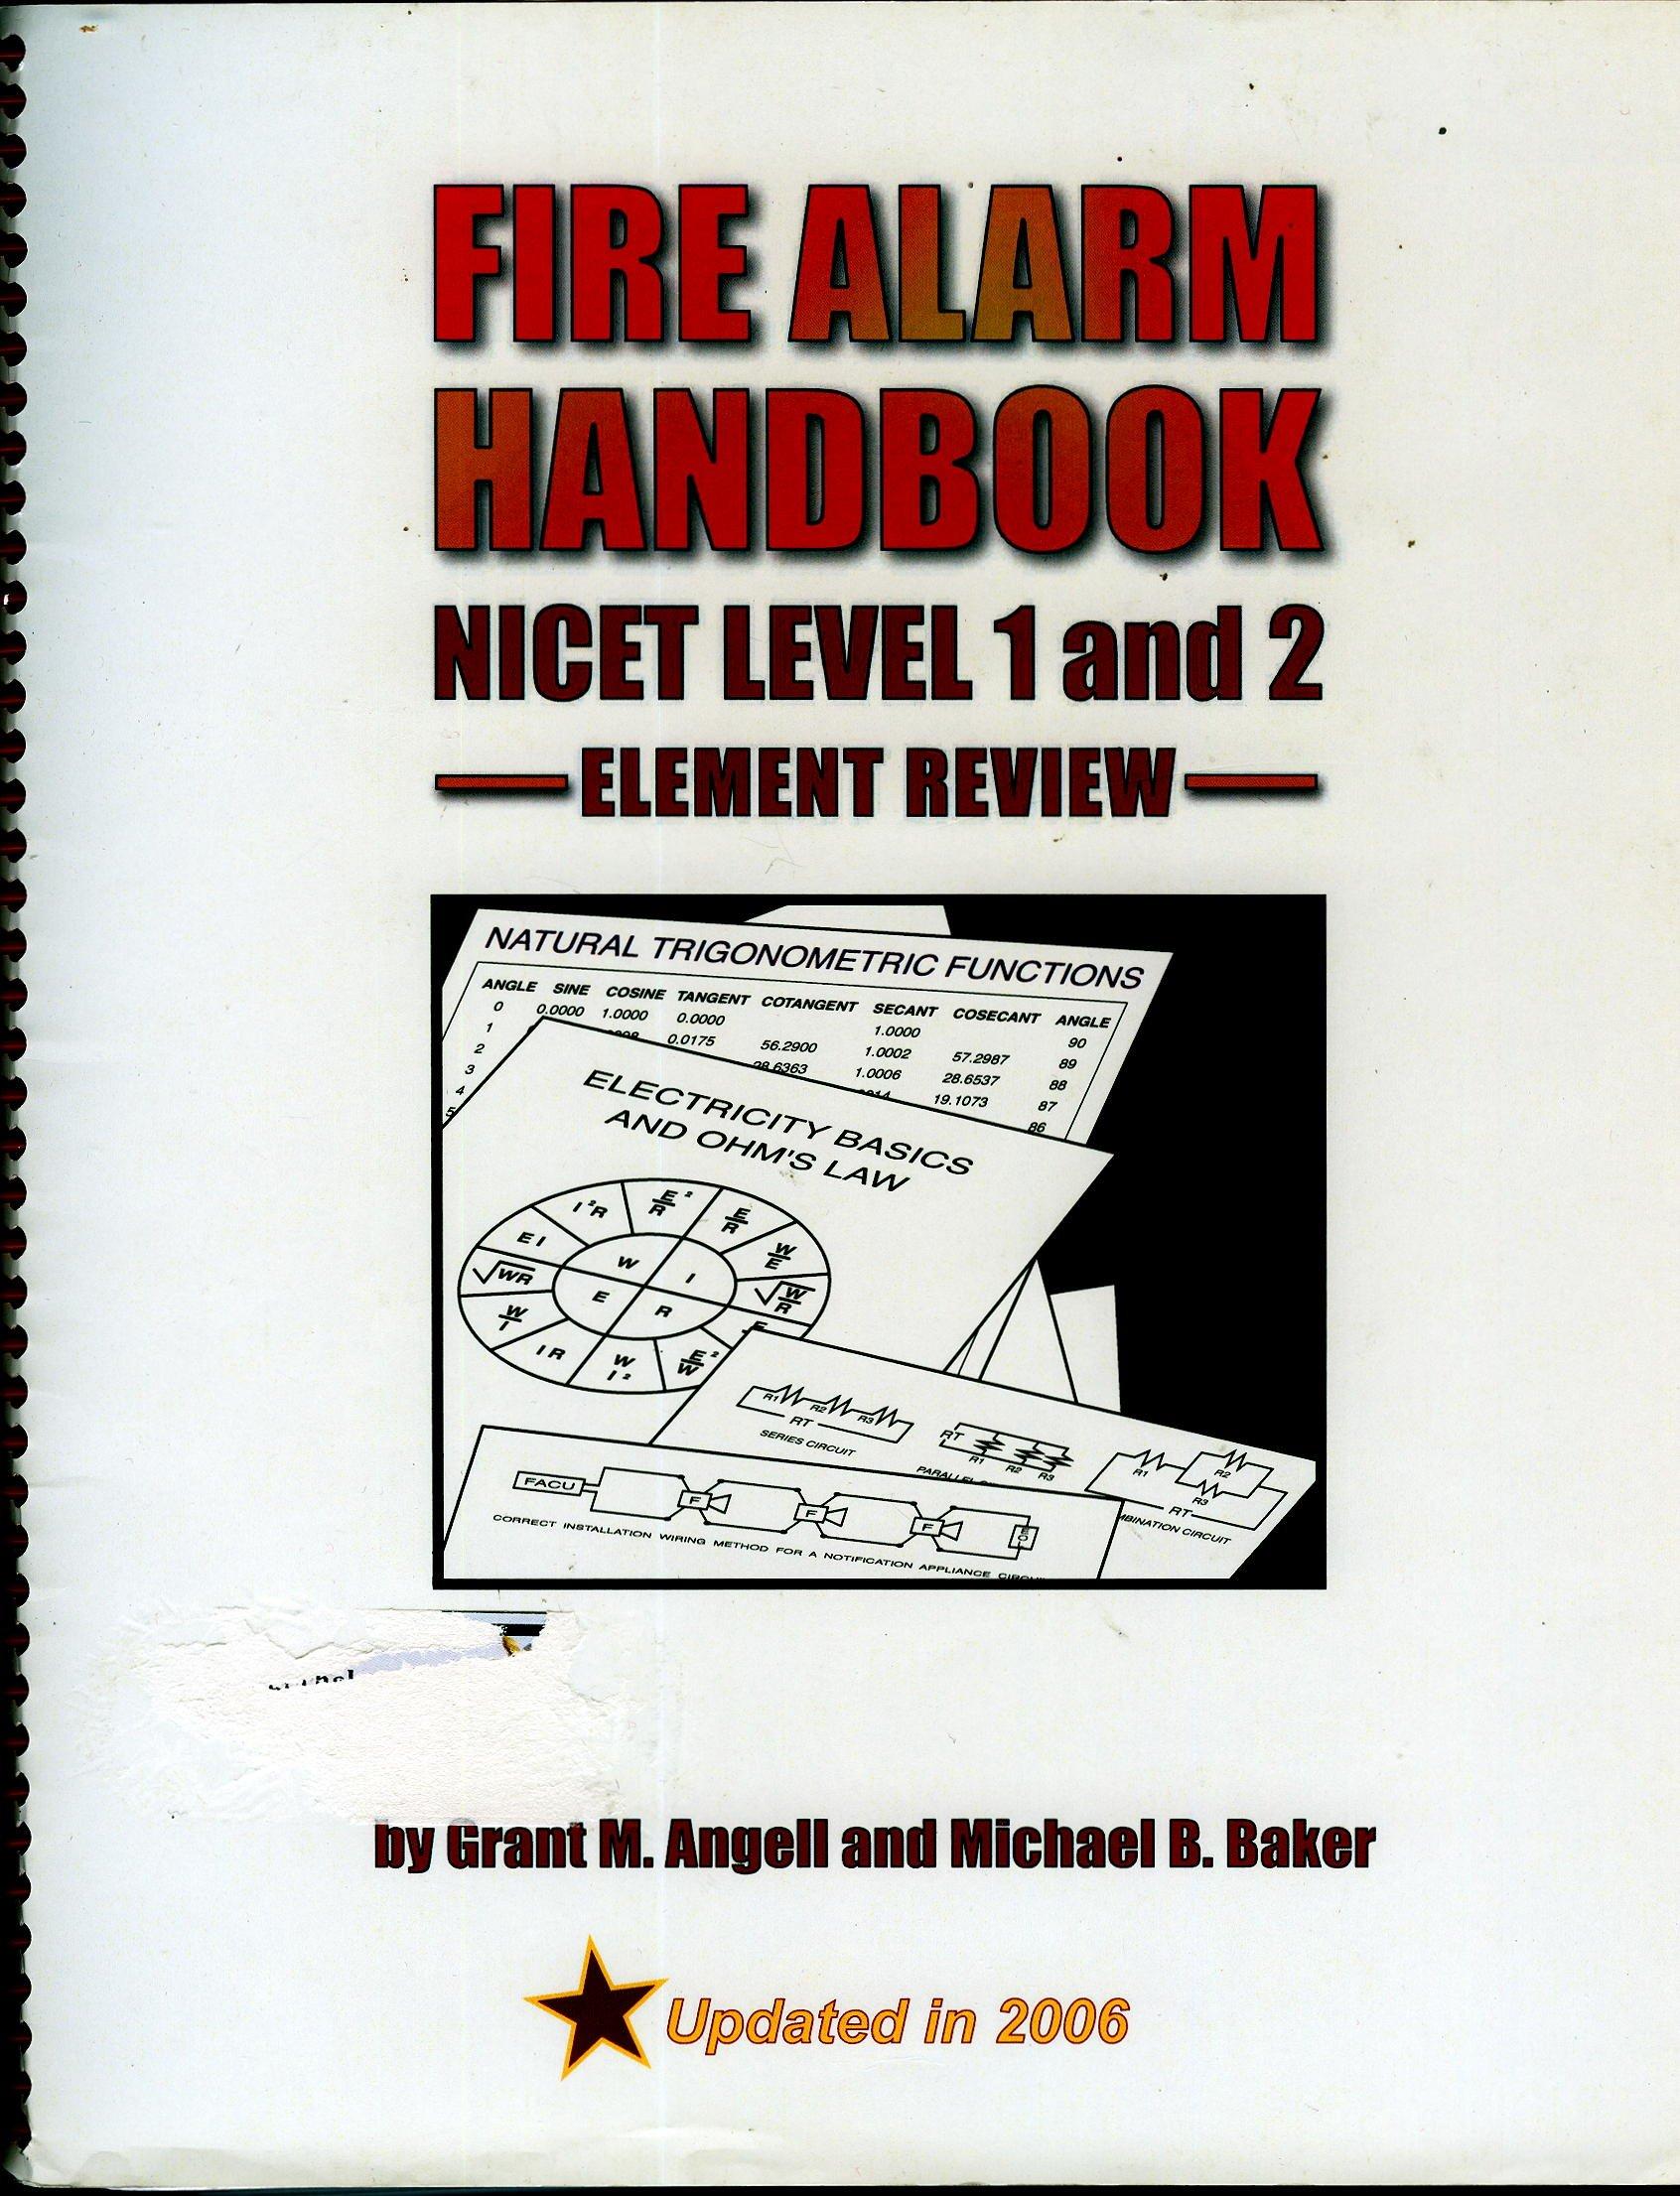 Fire Alarm Handbook Nicet Level 1 2 Grant M Angell Michael B